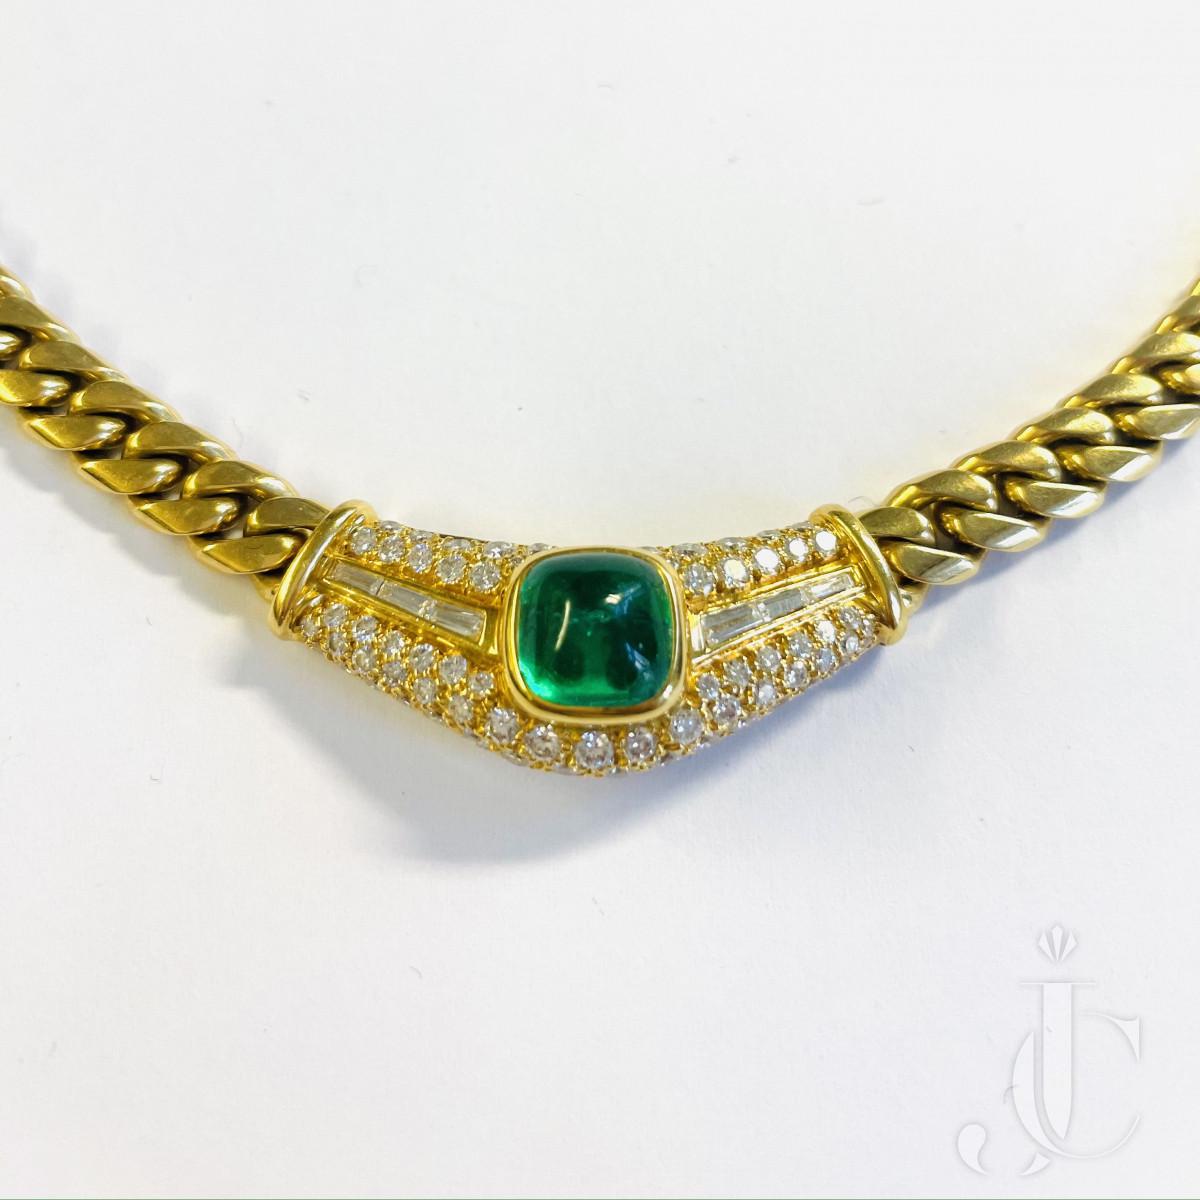 Bulgari Emerald Collier